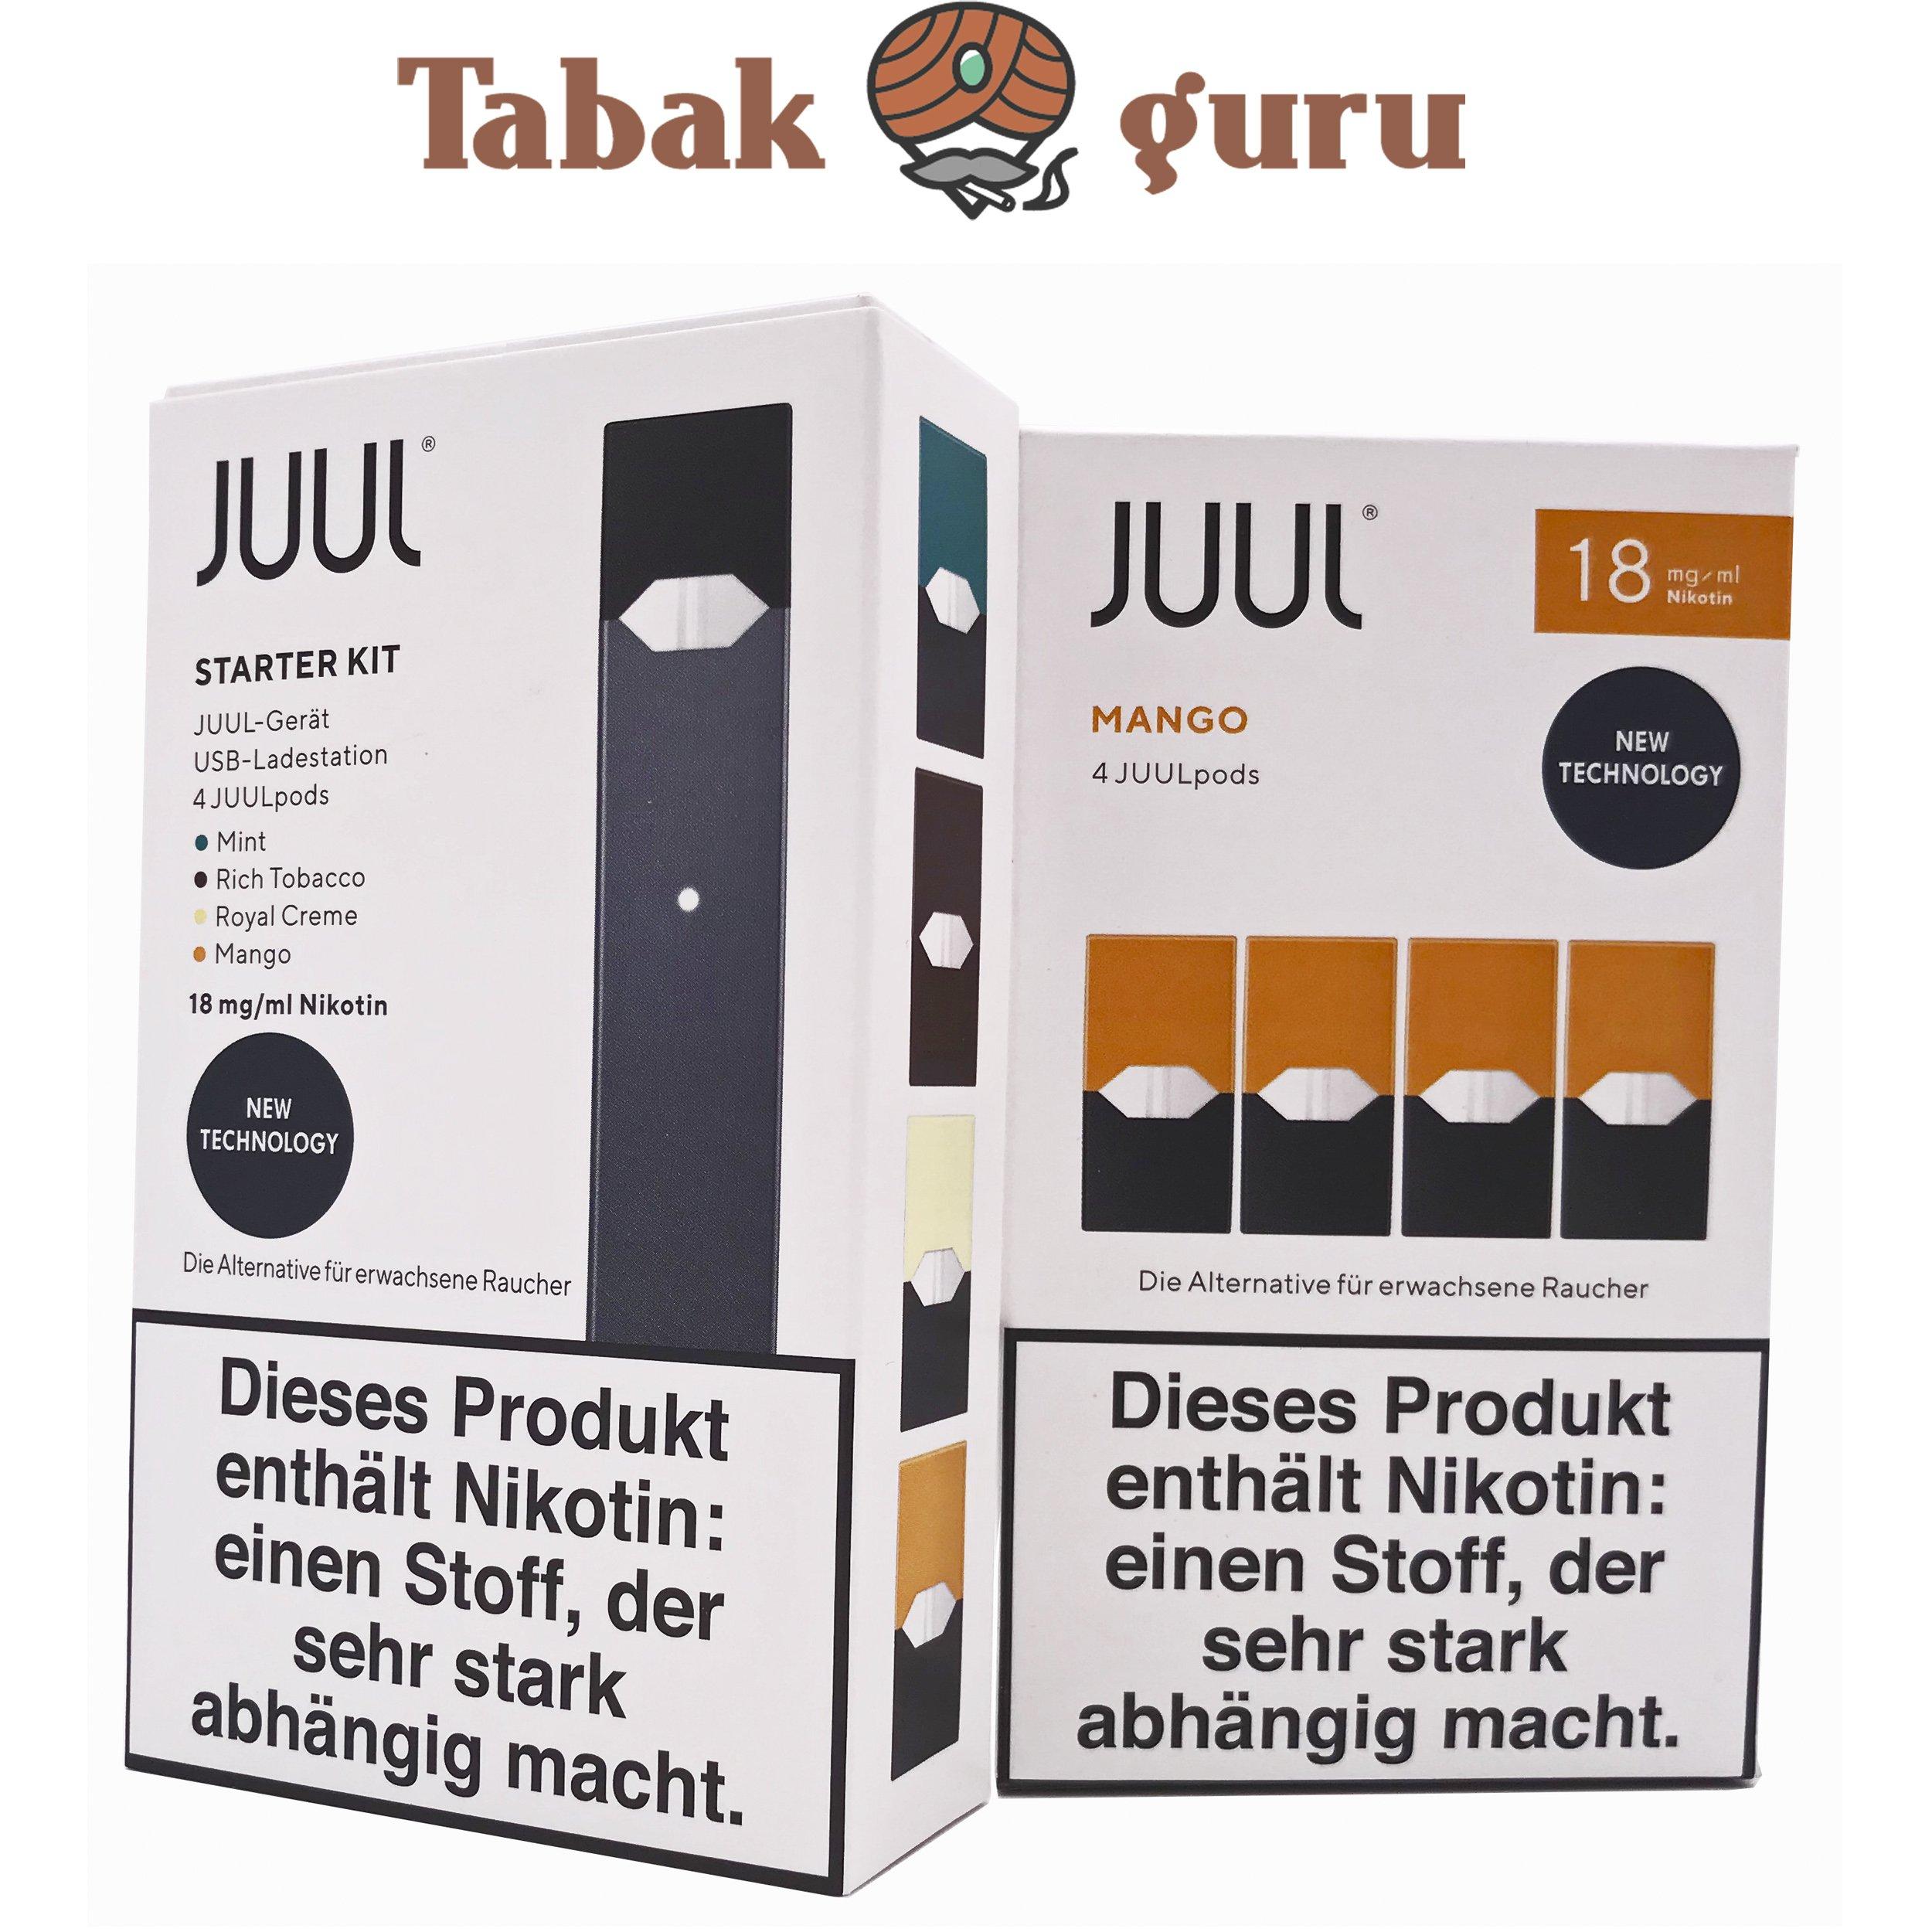 JUUL Starter-Kit mit 4 JUULpods Inkl. 4 JUULpods Mango 18mg